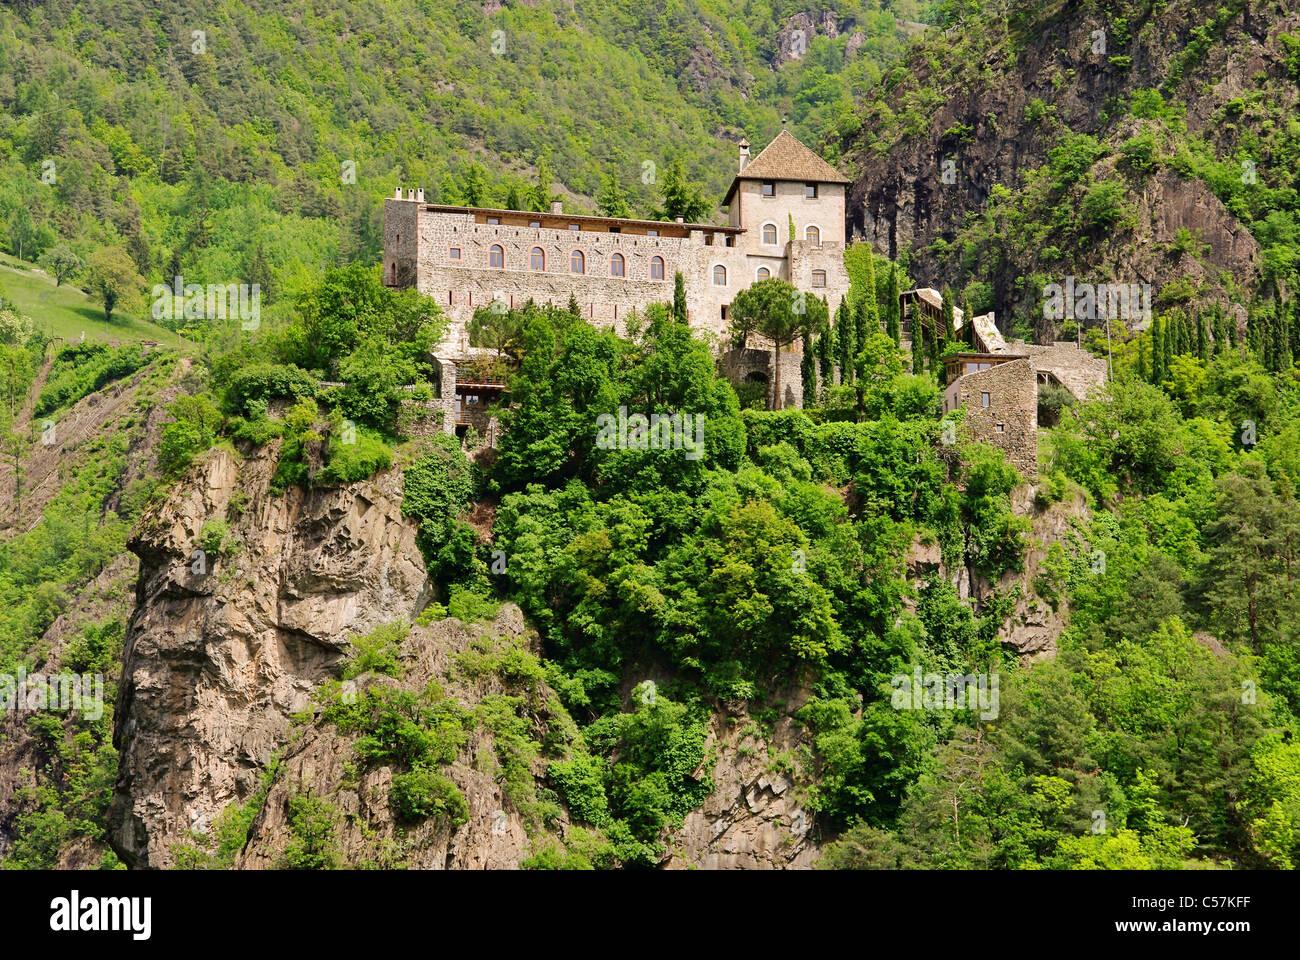 Castel Vanga 04 - Stock Image